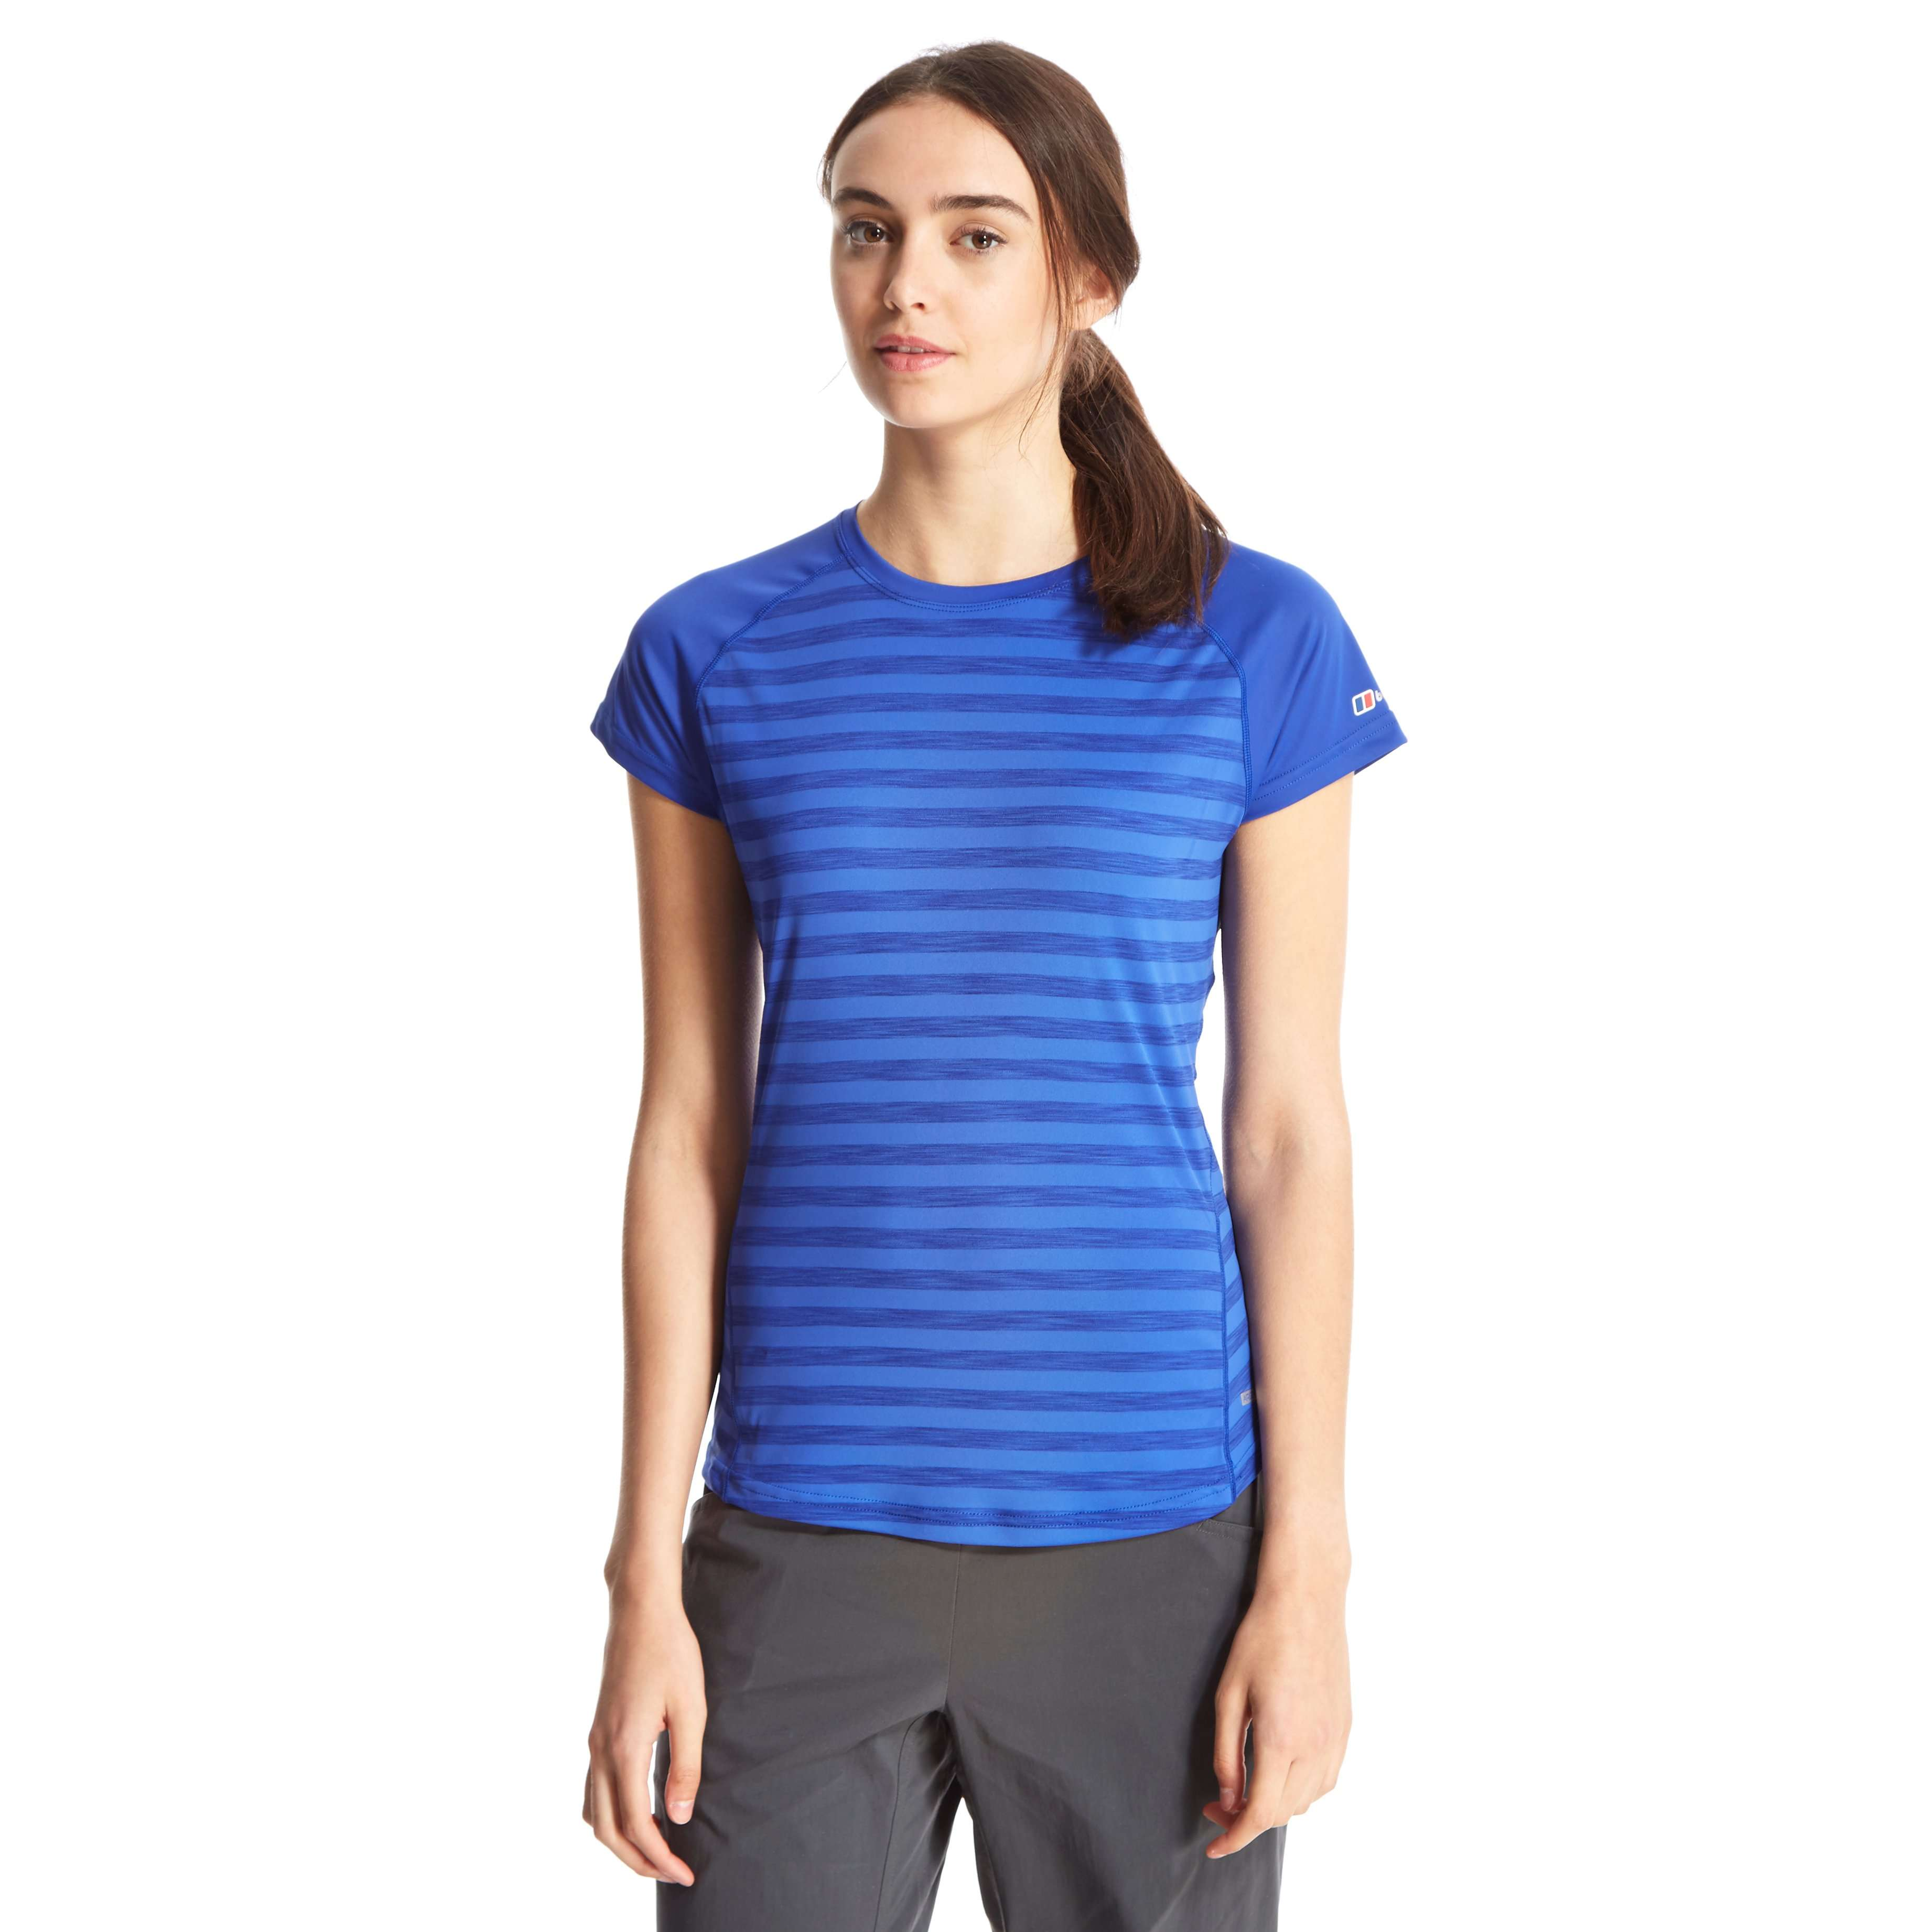 BERGHAUS Women's Stripe Short Sleeve Baselayer